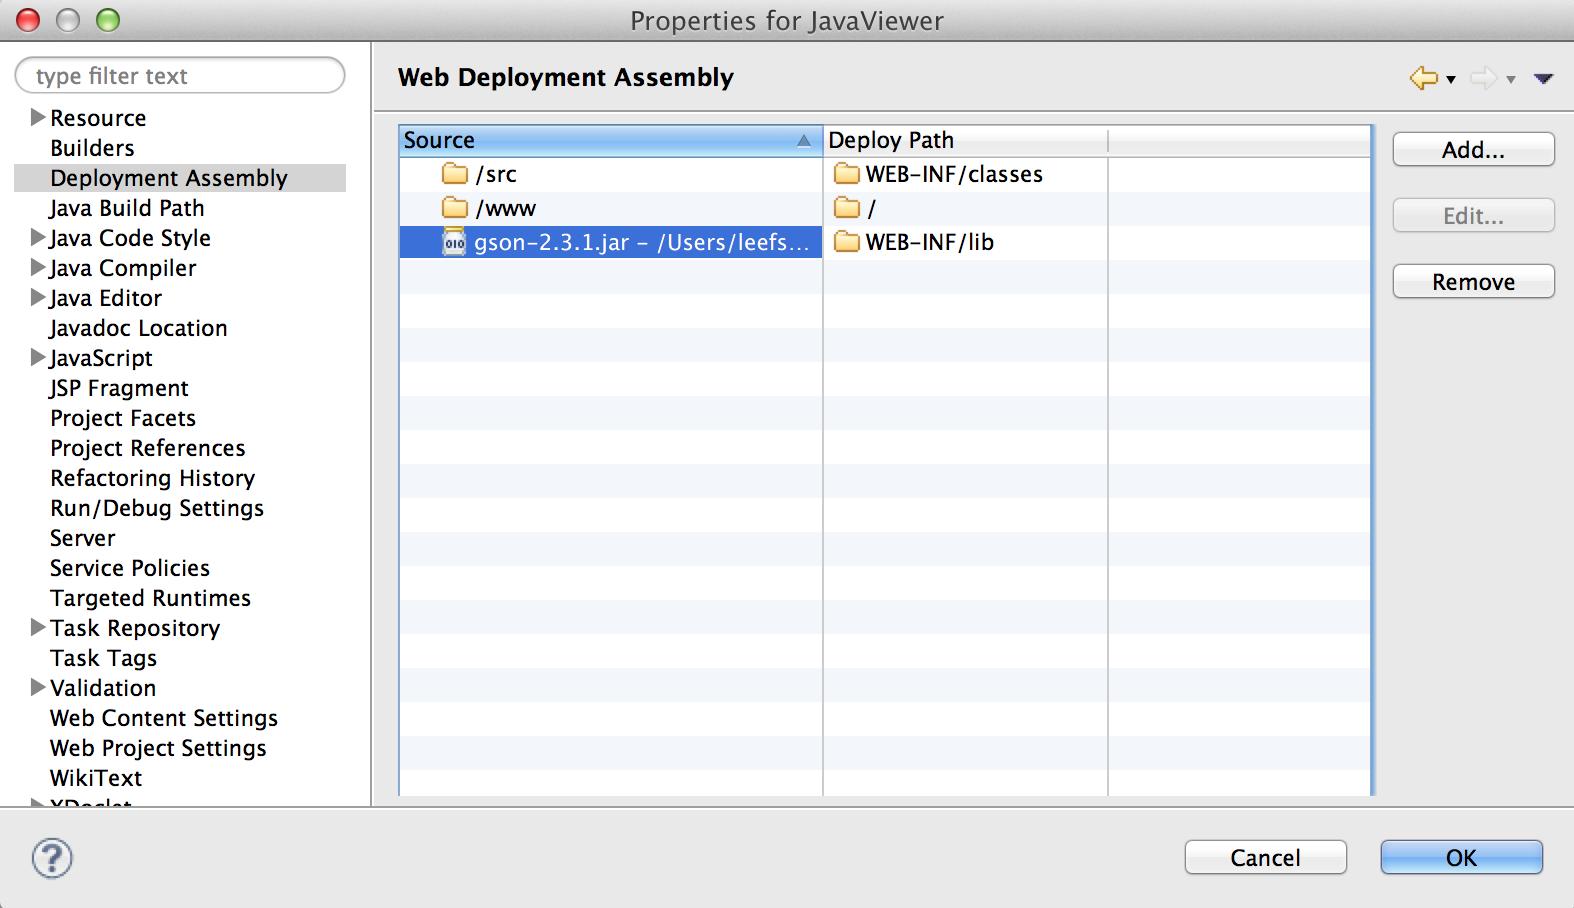 Become a Java EE developer - Part II: Basic RESTful API from